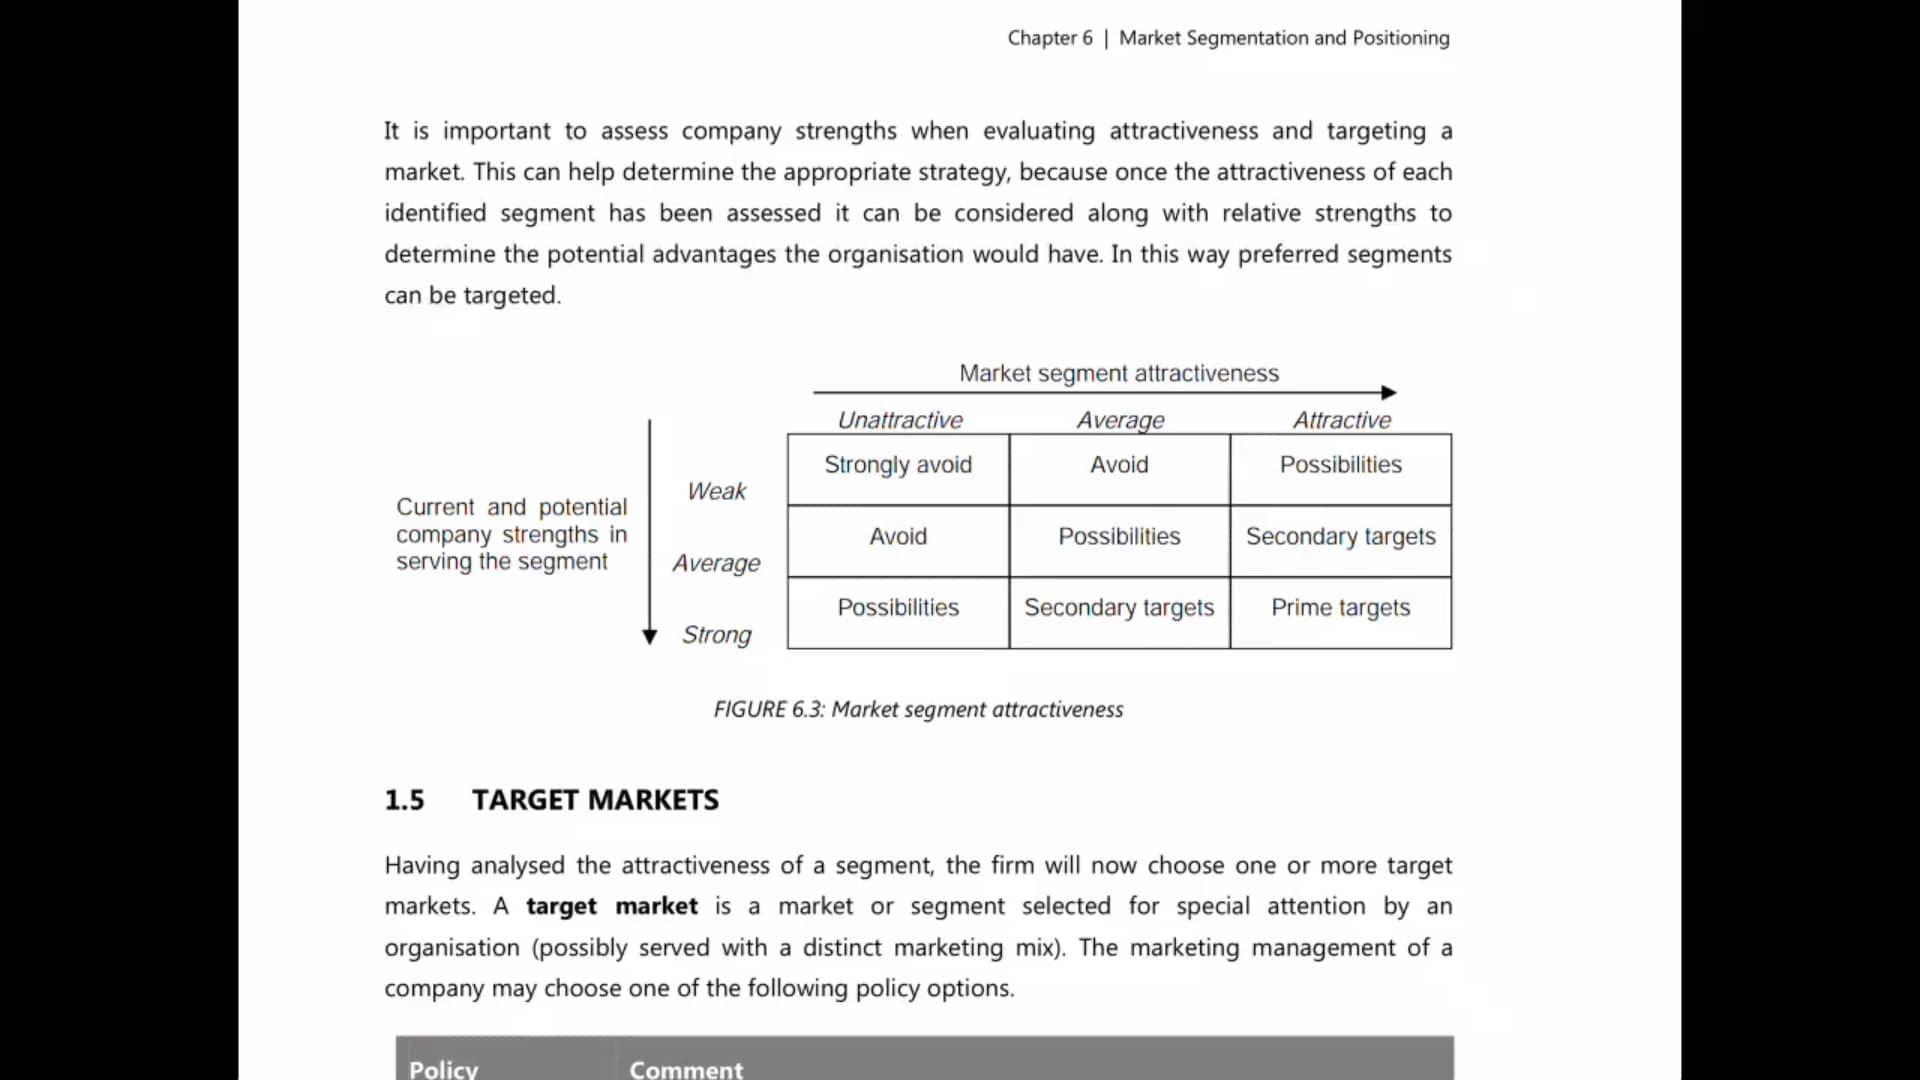 Ch 6 - Target market